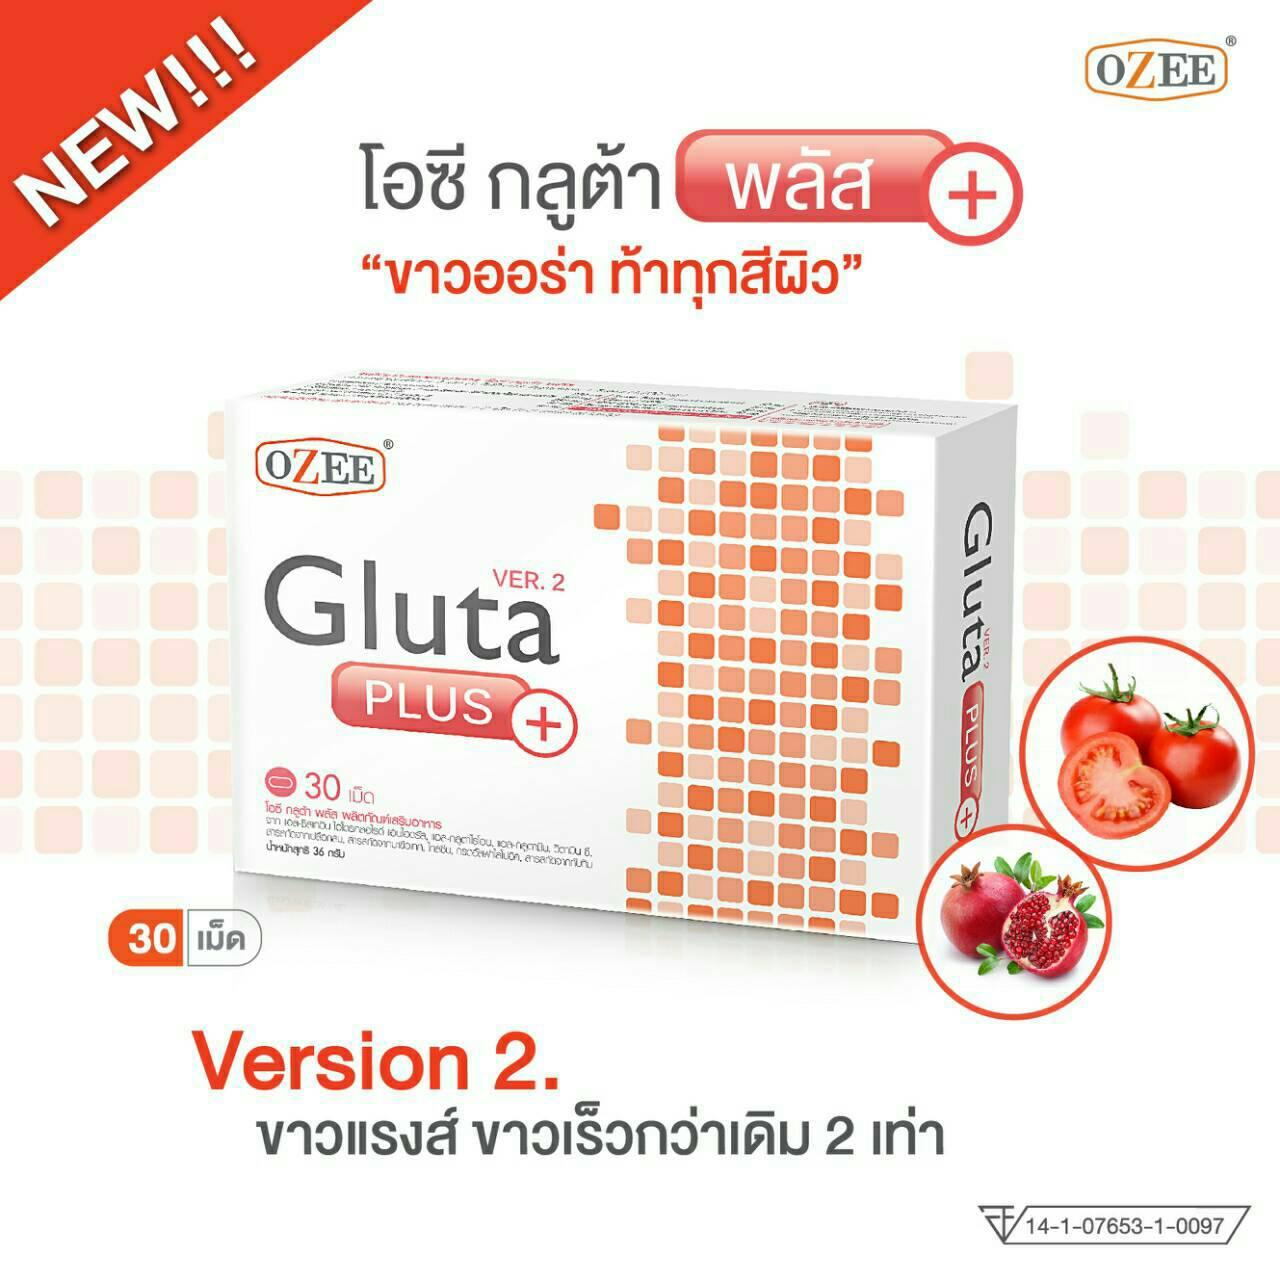 Ozee gluta plus โอซี กลูต้า พลัส สูตรใหม่ ขาวท้าออร่า (version 2 แทนozee Gluta 20 เม็ด)